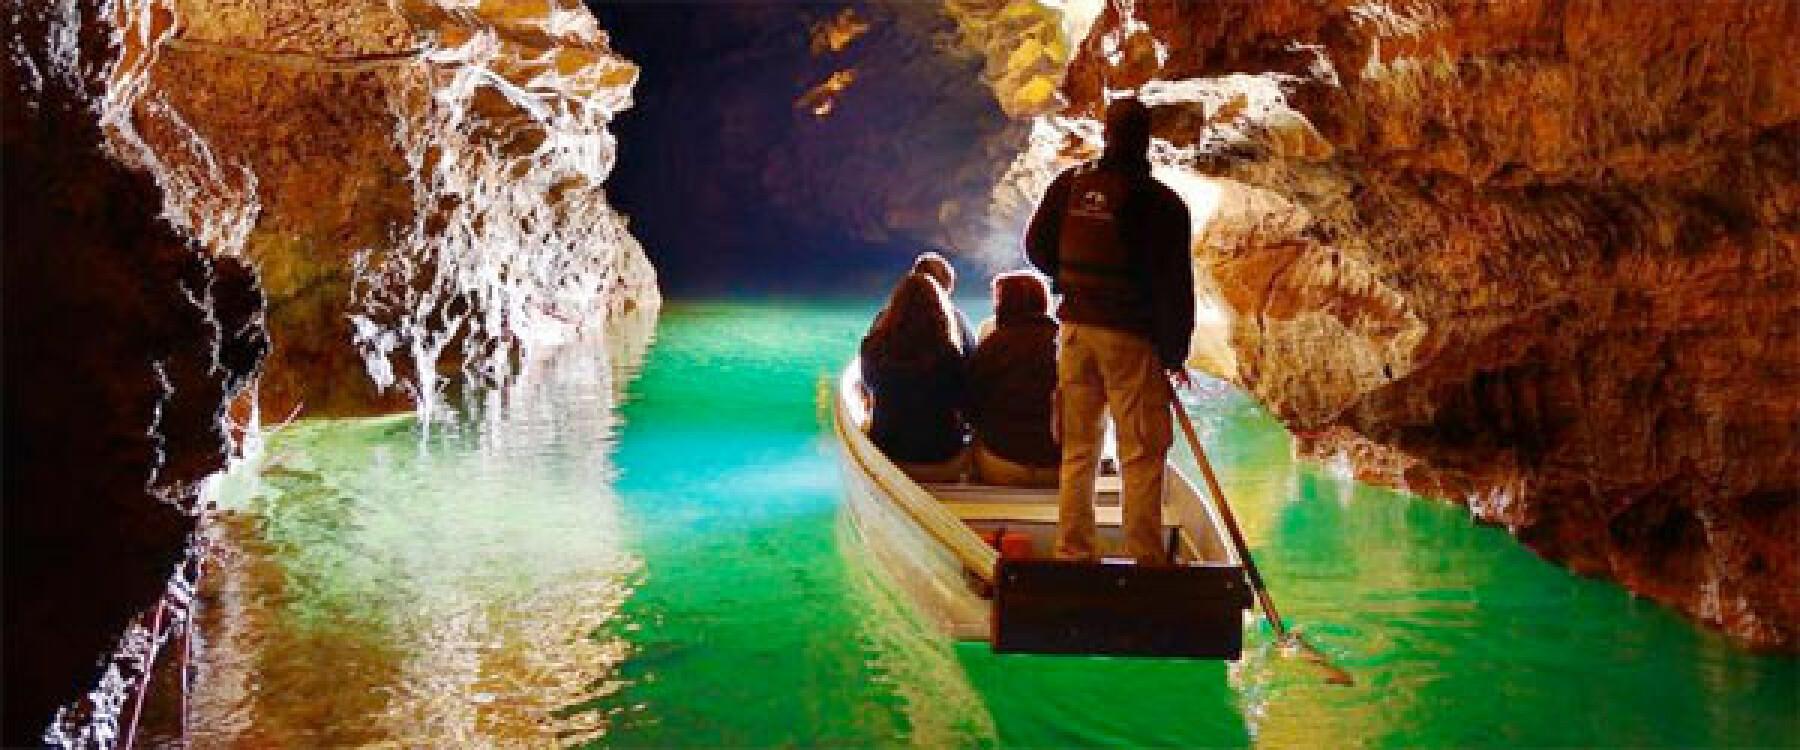 GrottesGouffrePadirac600x250